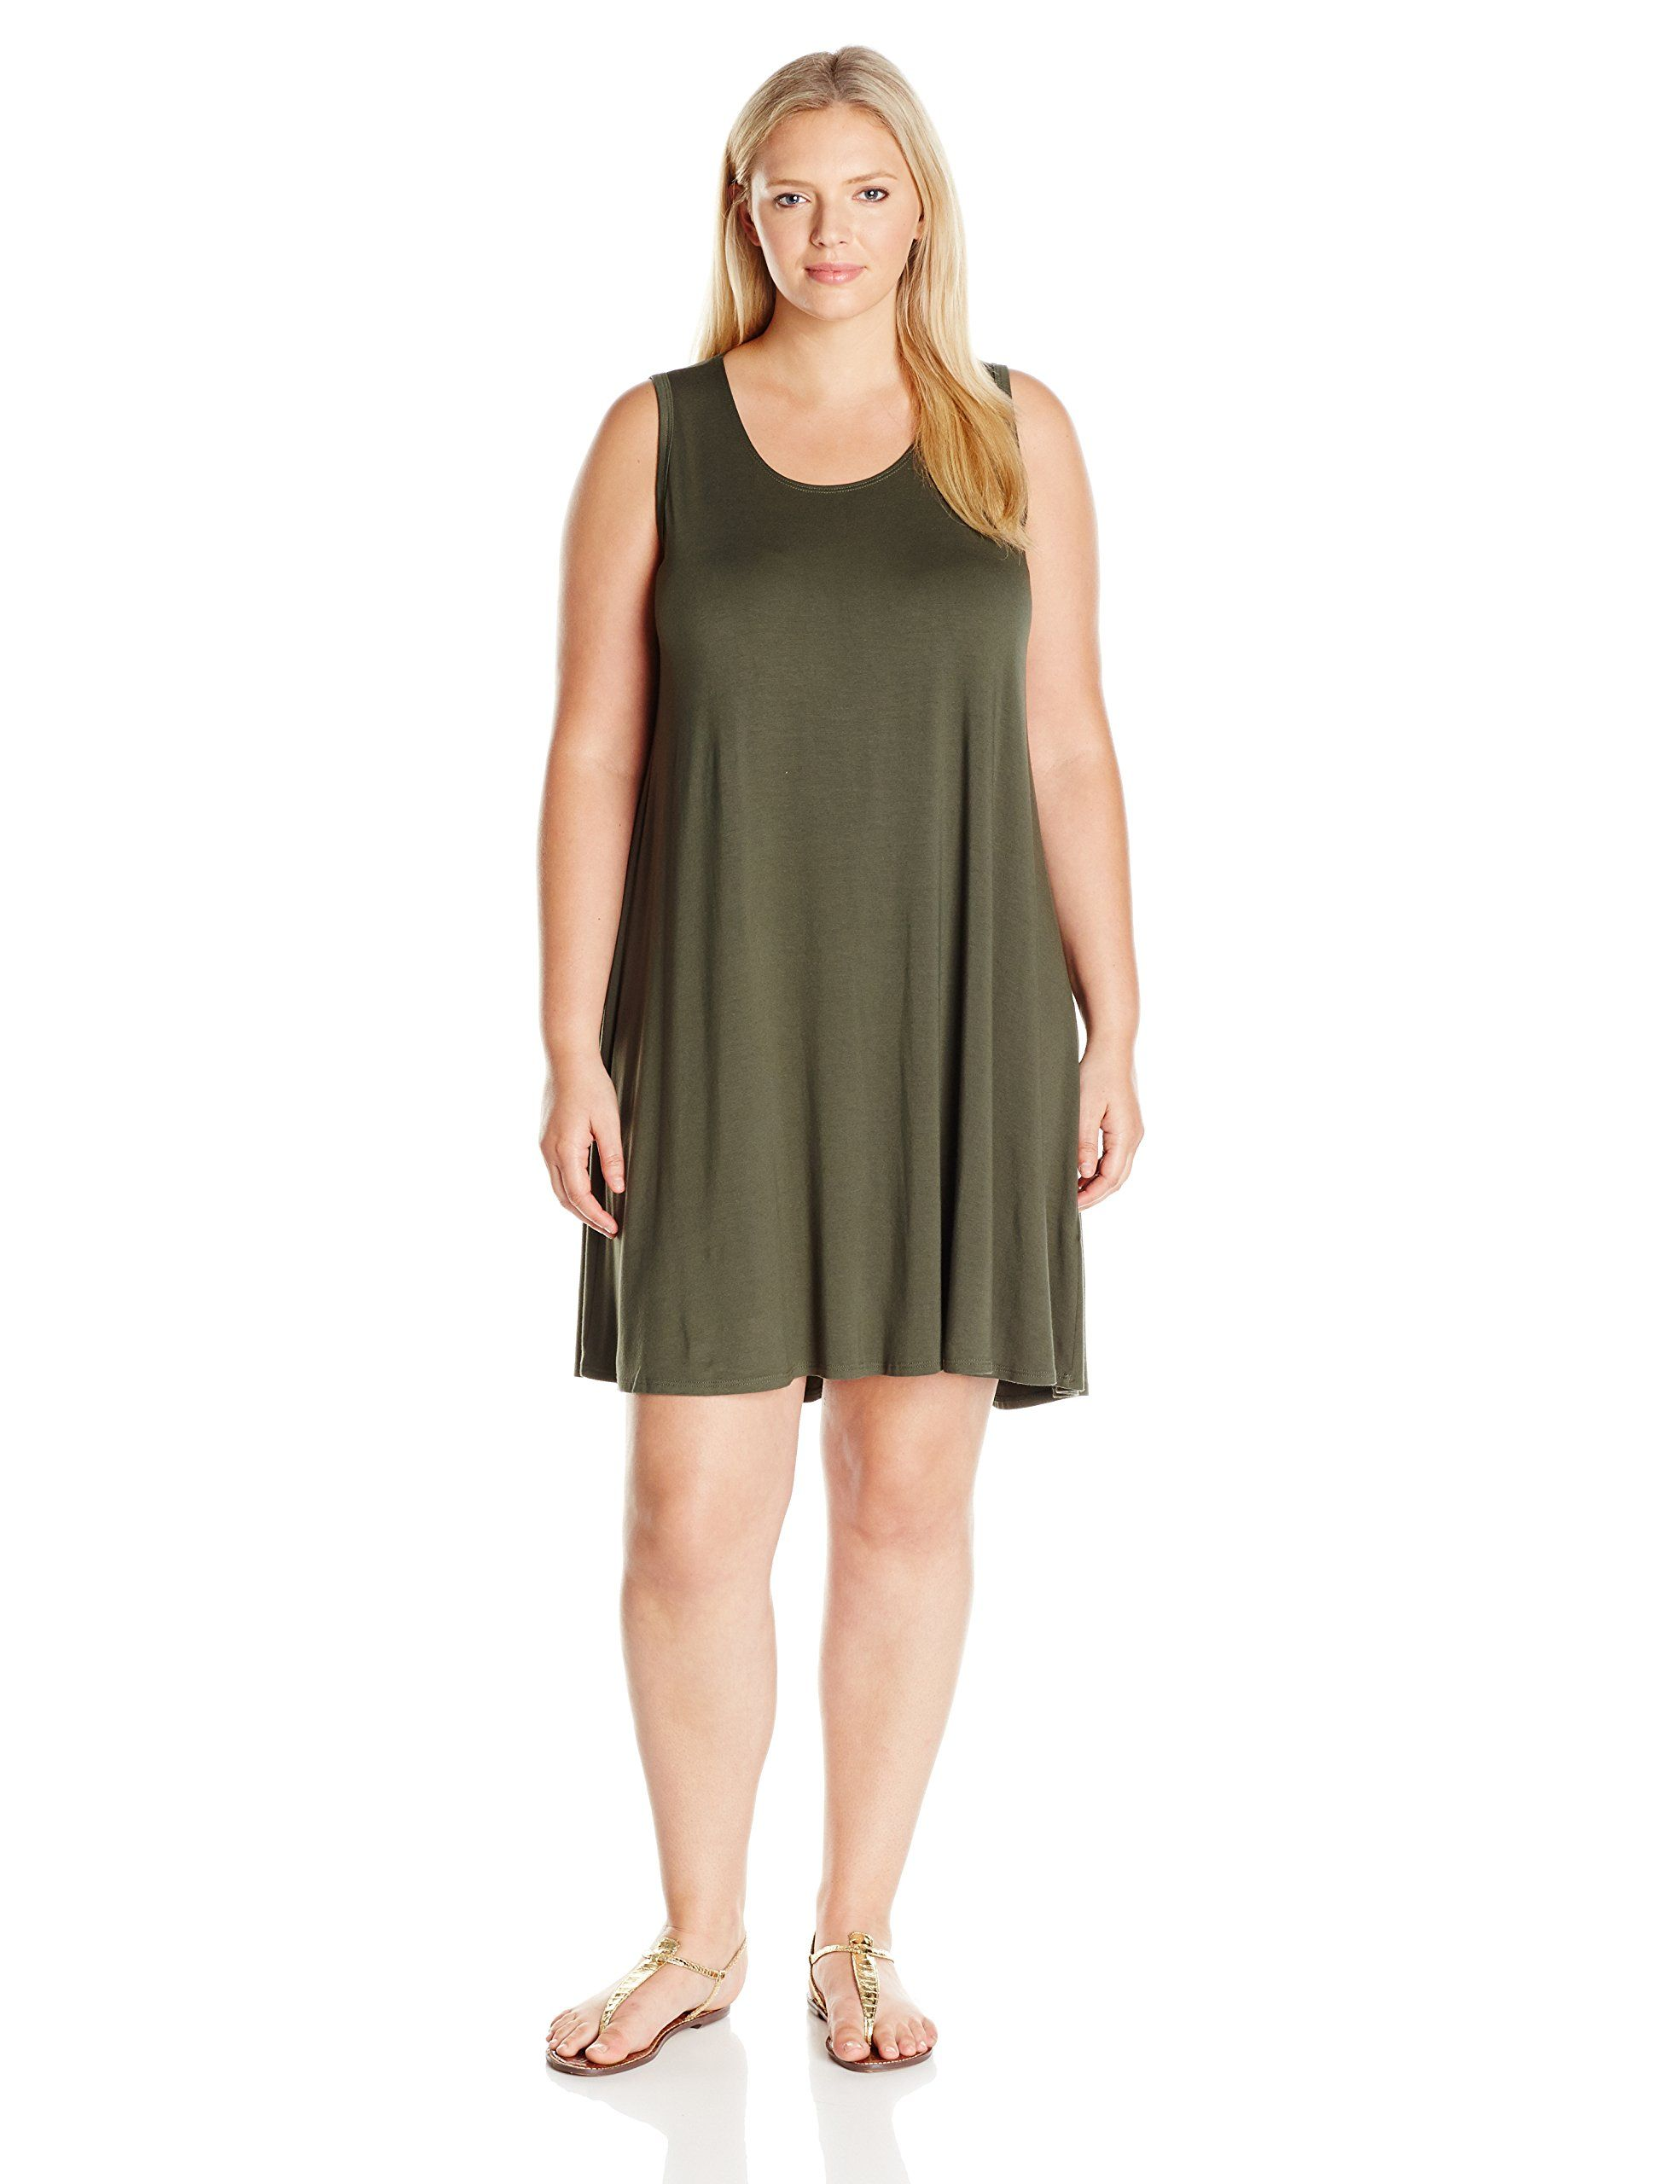 Karen Kane Womens Plus Size Olive Green Maggie Trapeze Dress